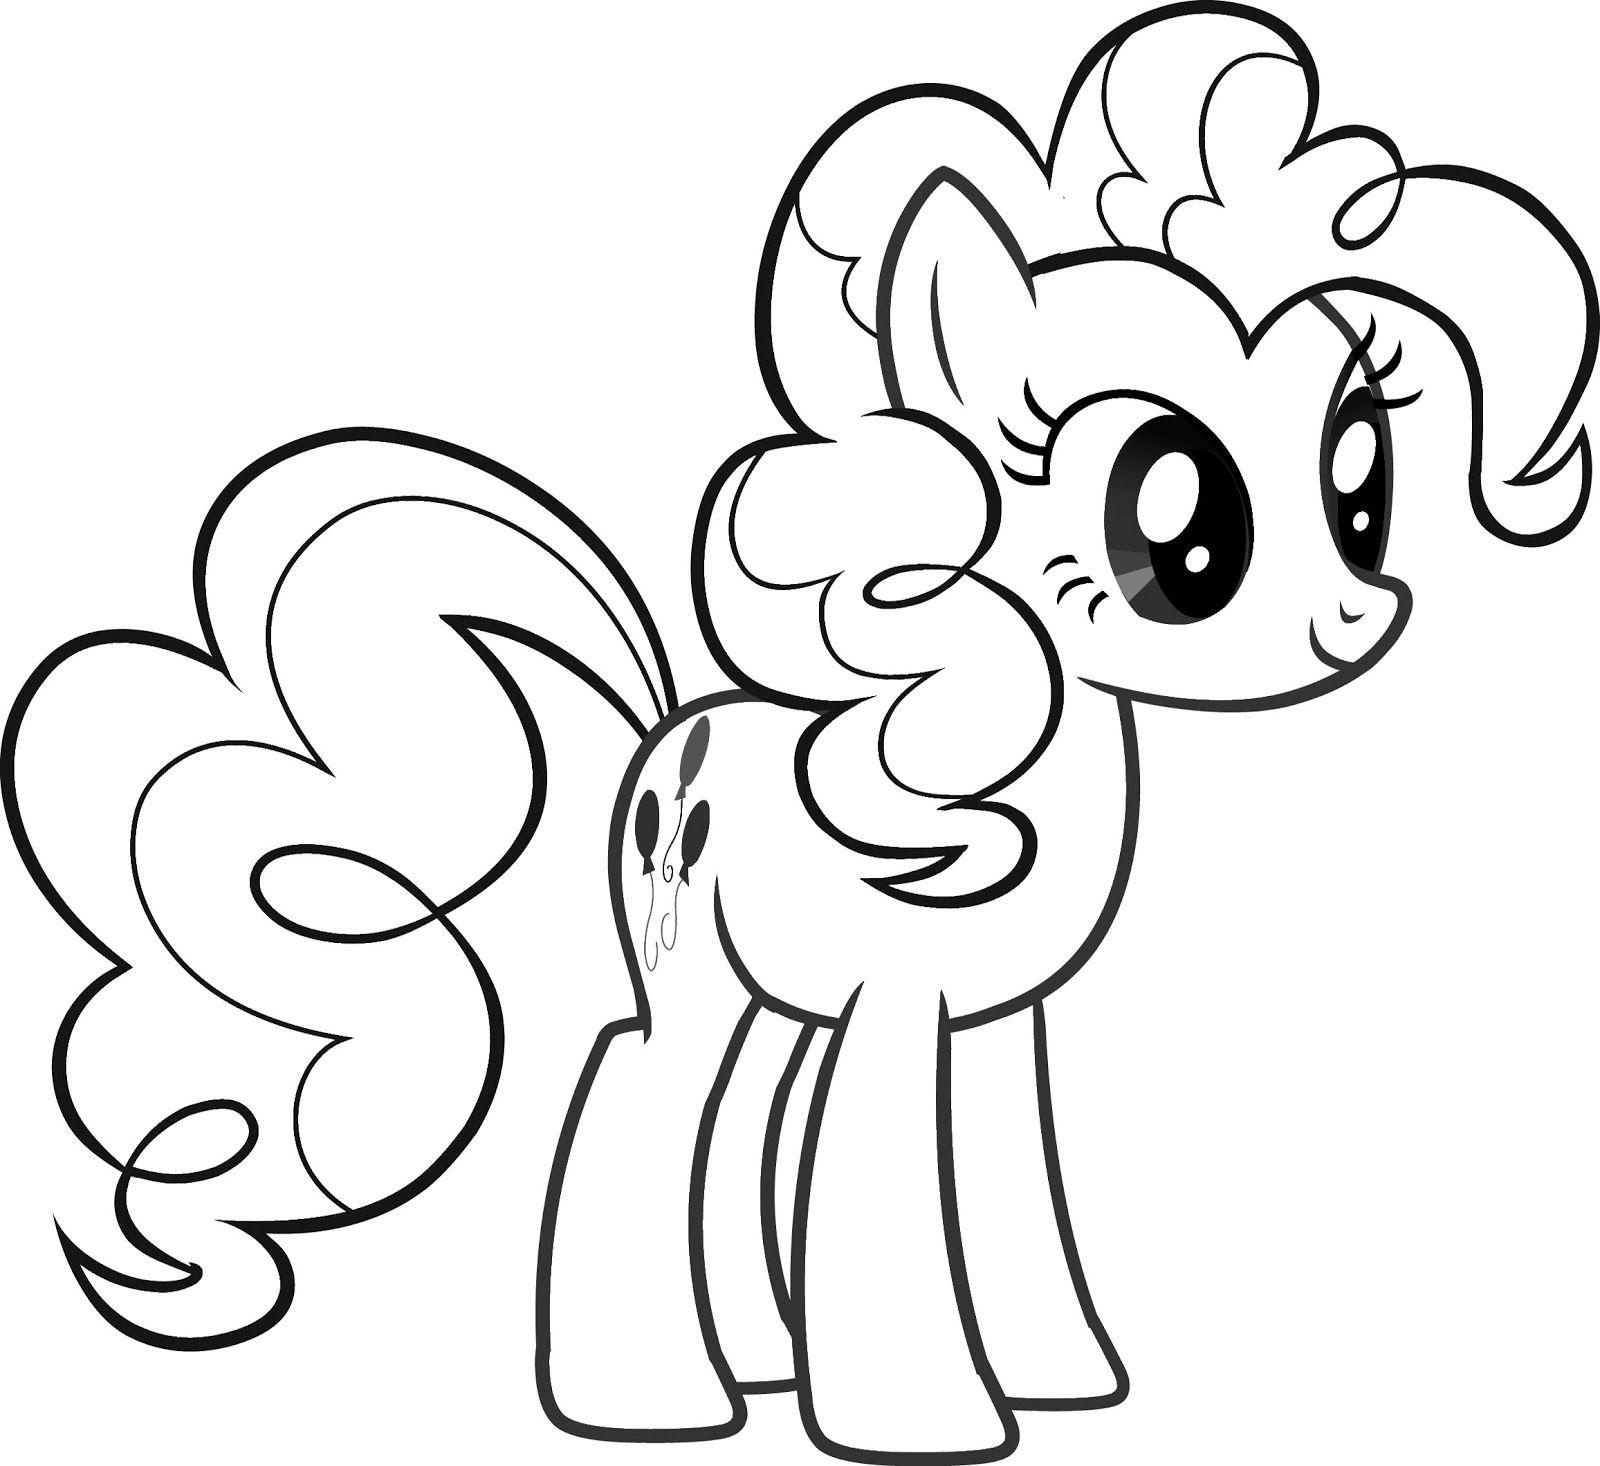 My Little Pony Please Download S My Little Pony Coloring Page On Gambar Kuda Kuda Poni Gambar Poni